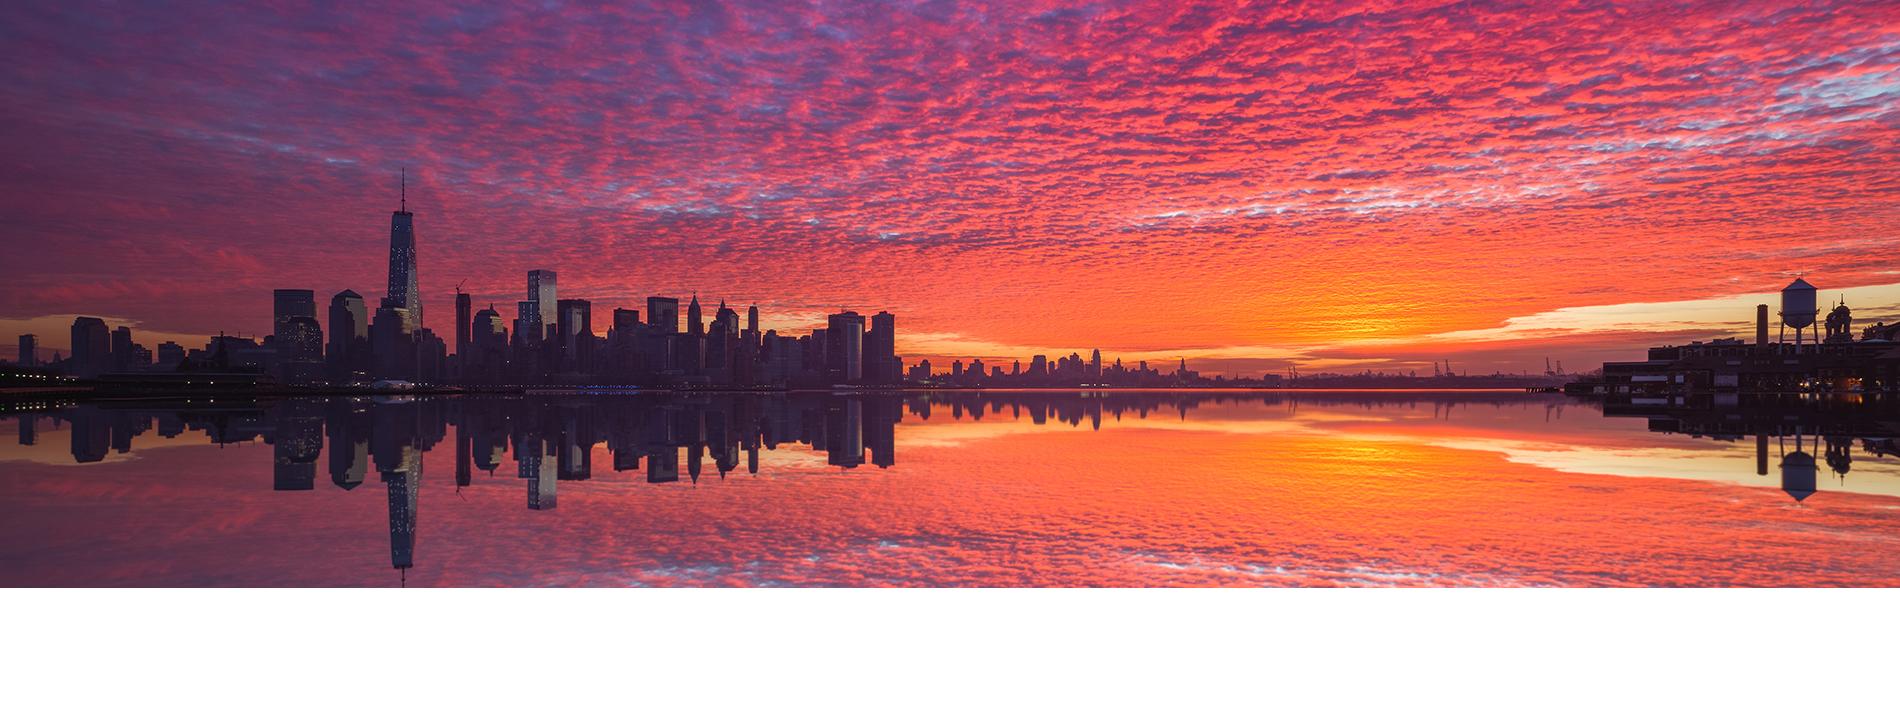 MV-web_Sunrise_in_the_city